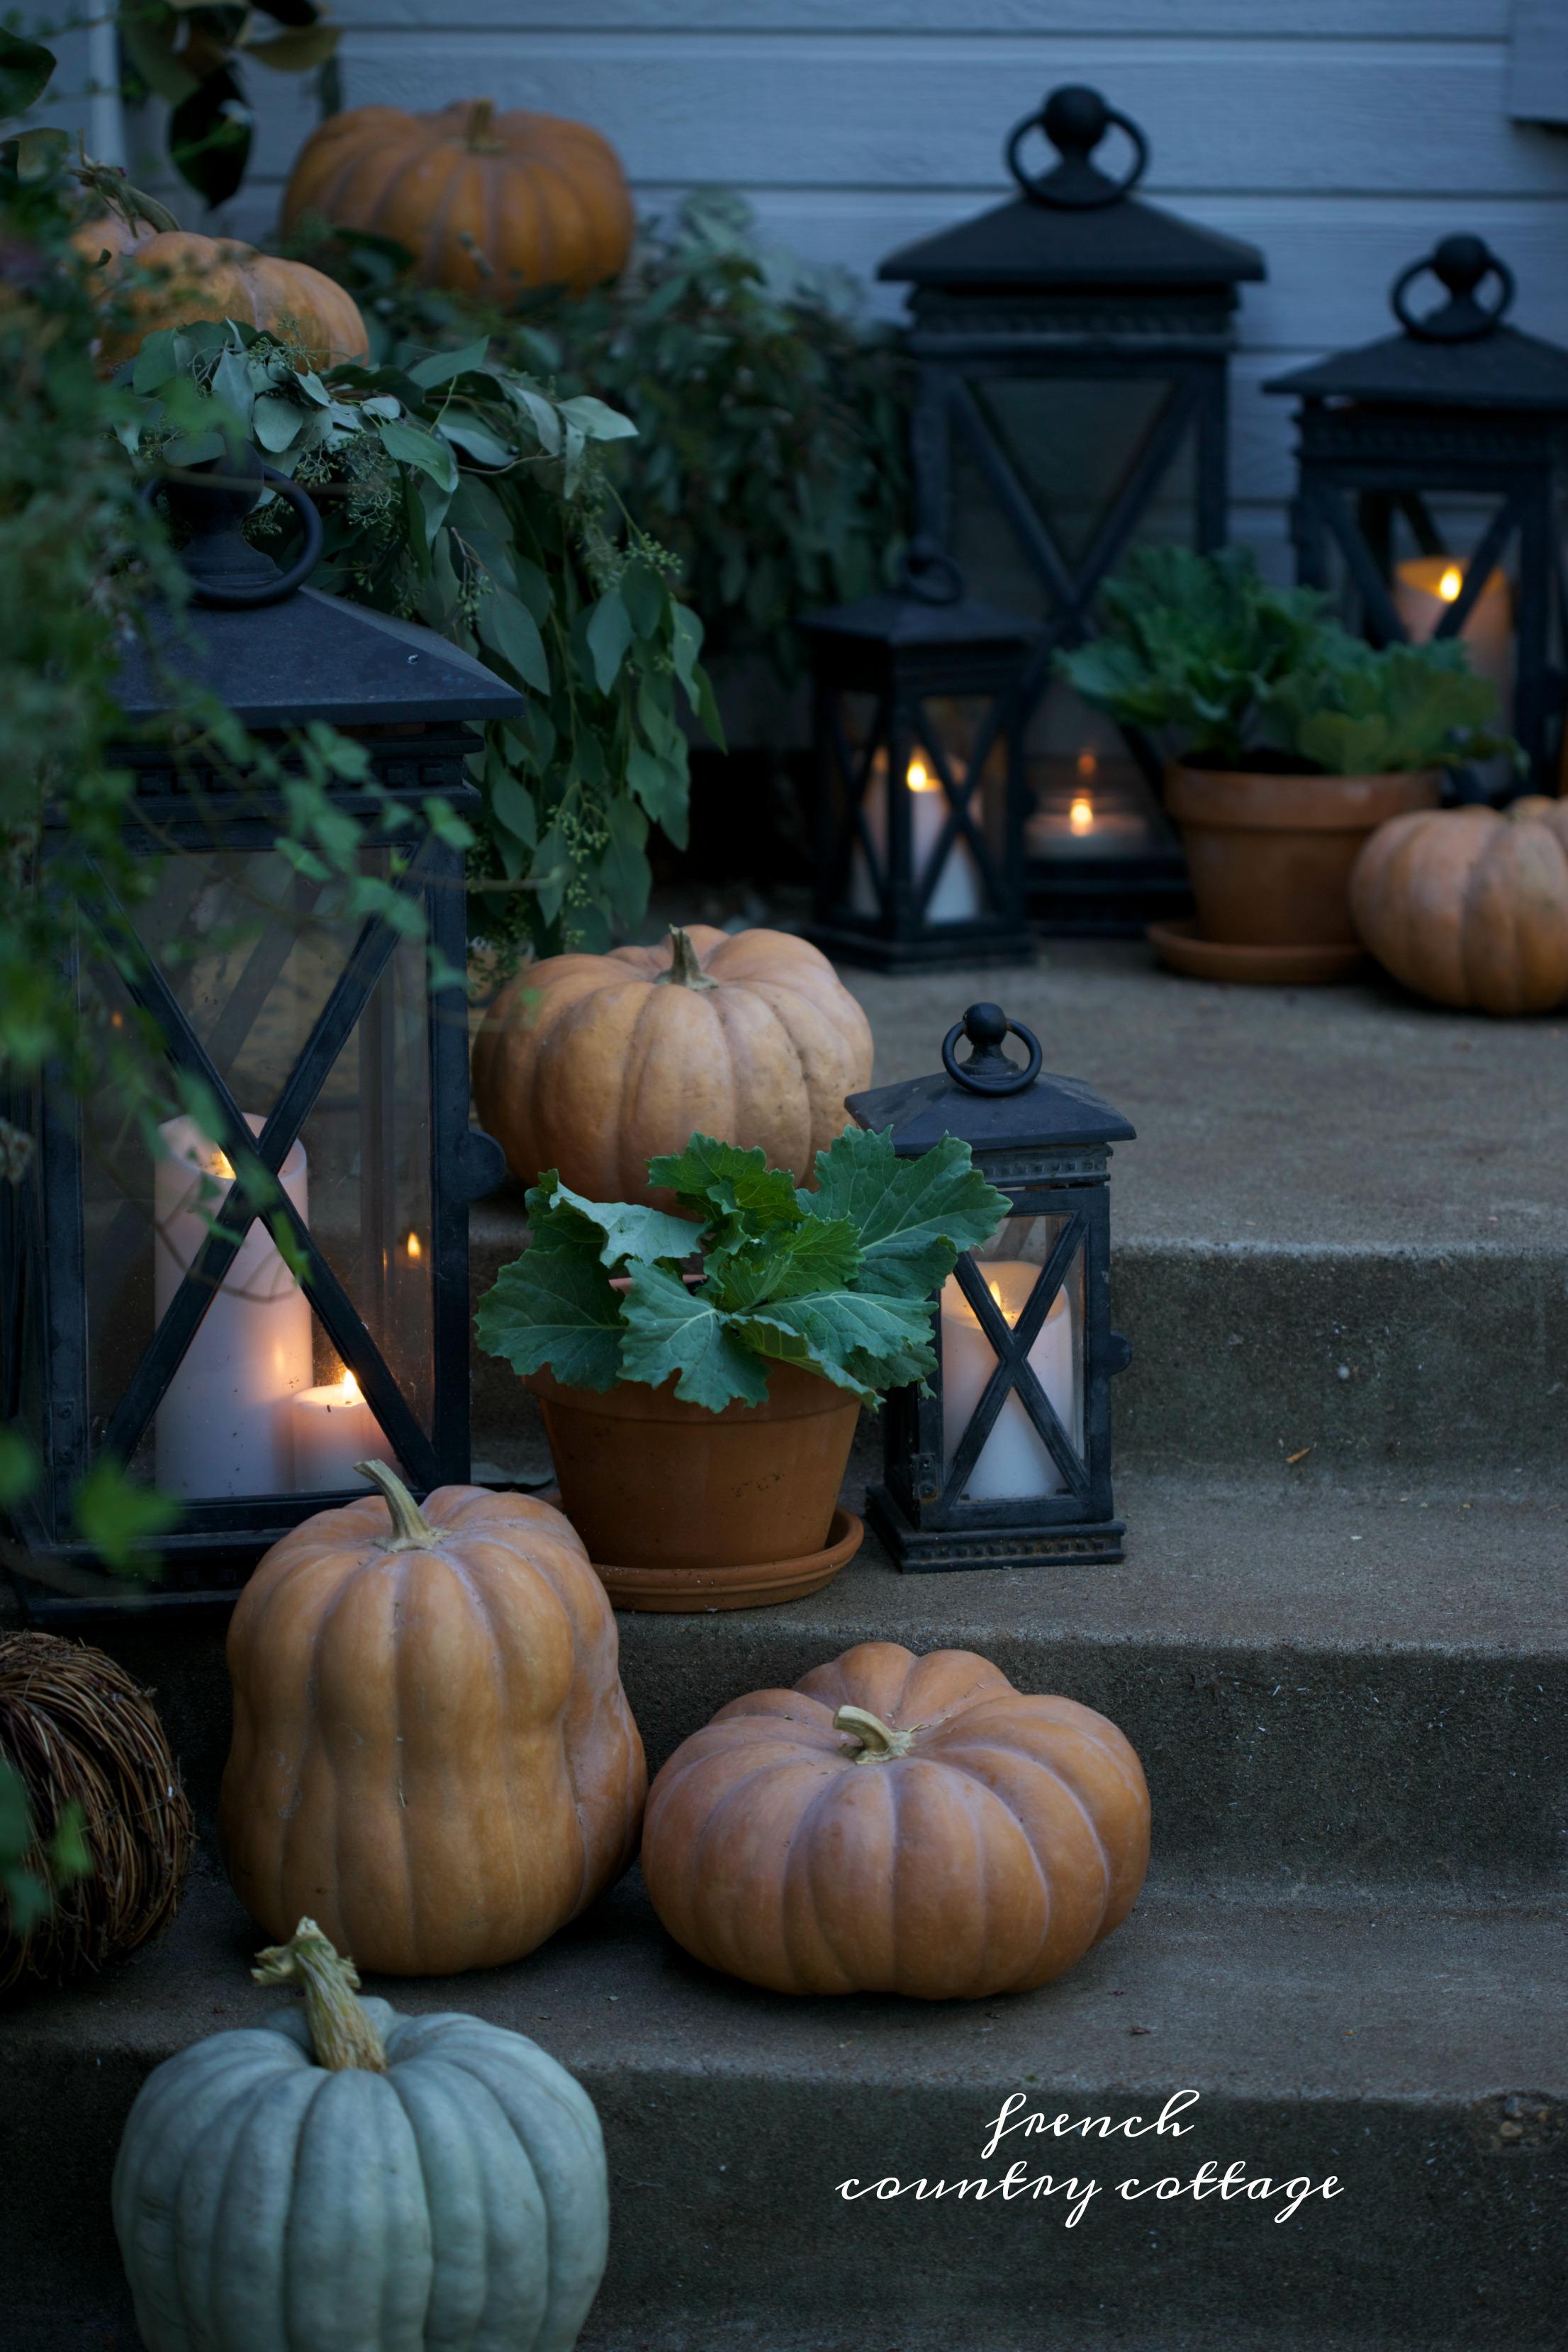 Pumpkin and foliage arrangement with lanterns